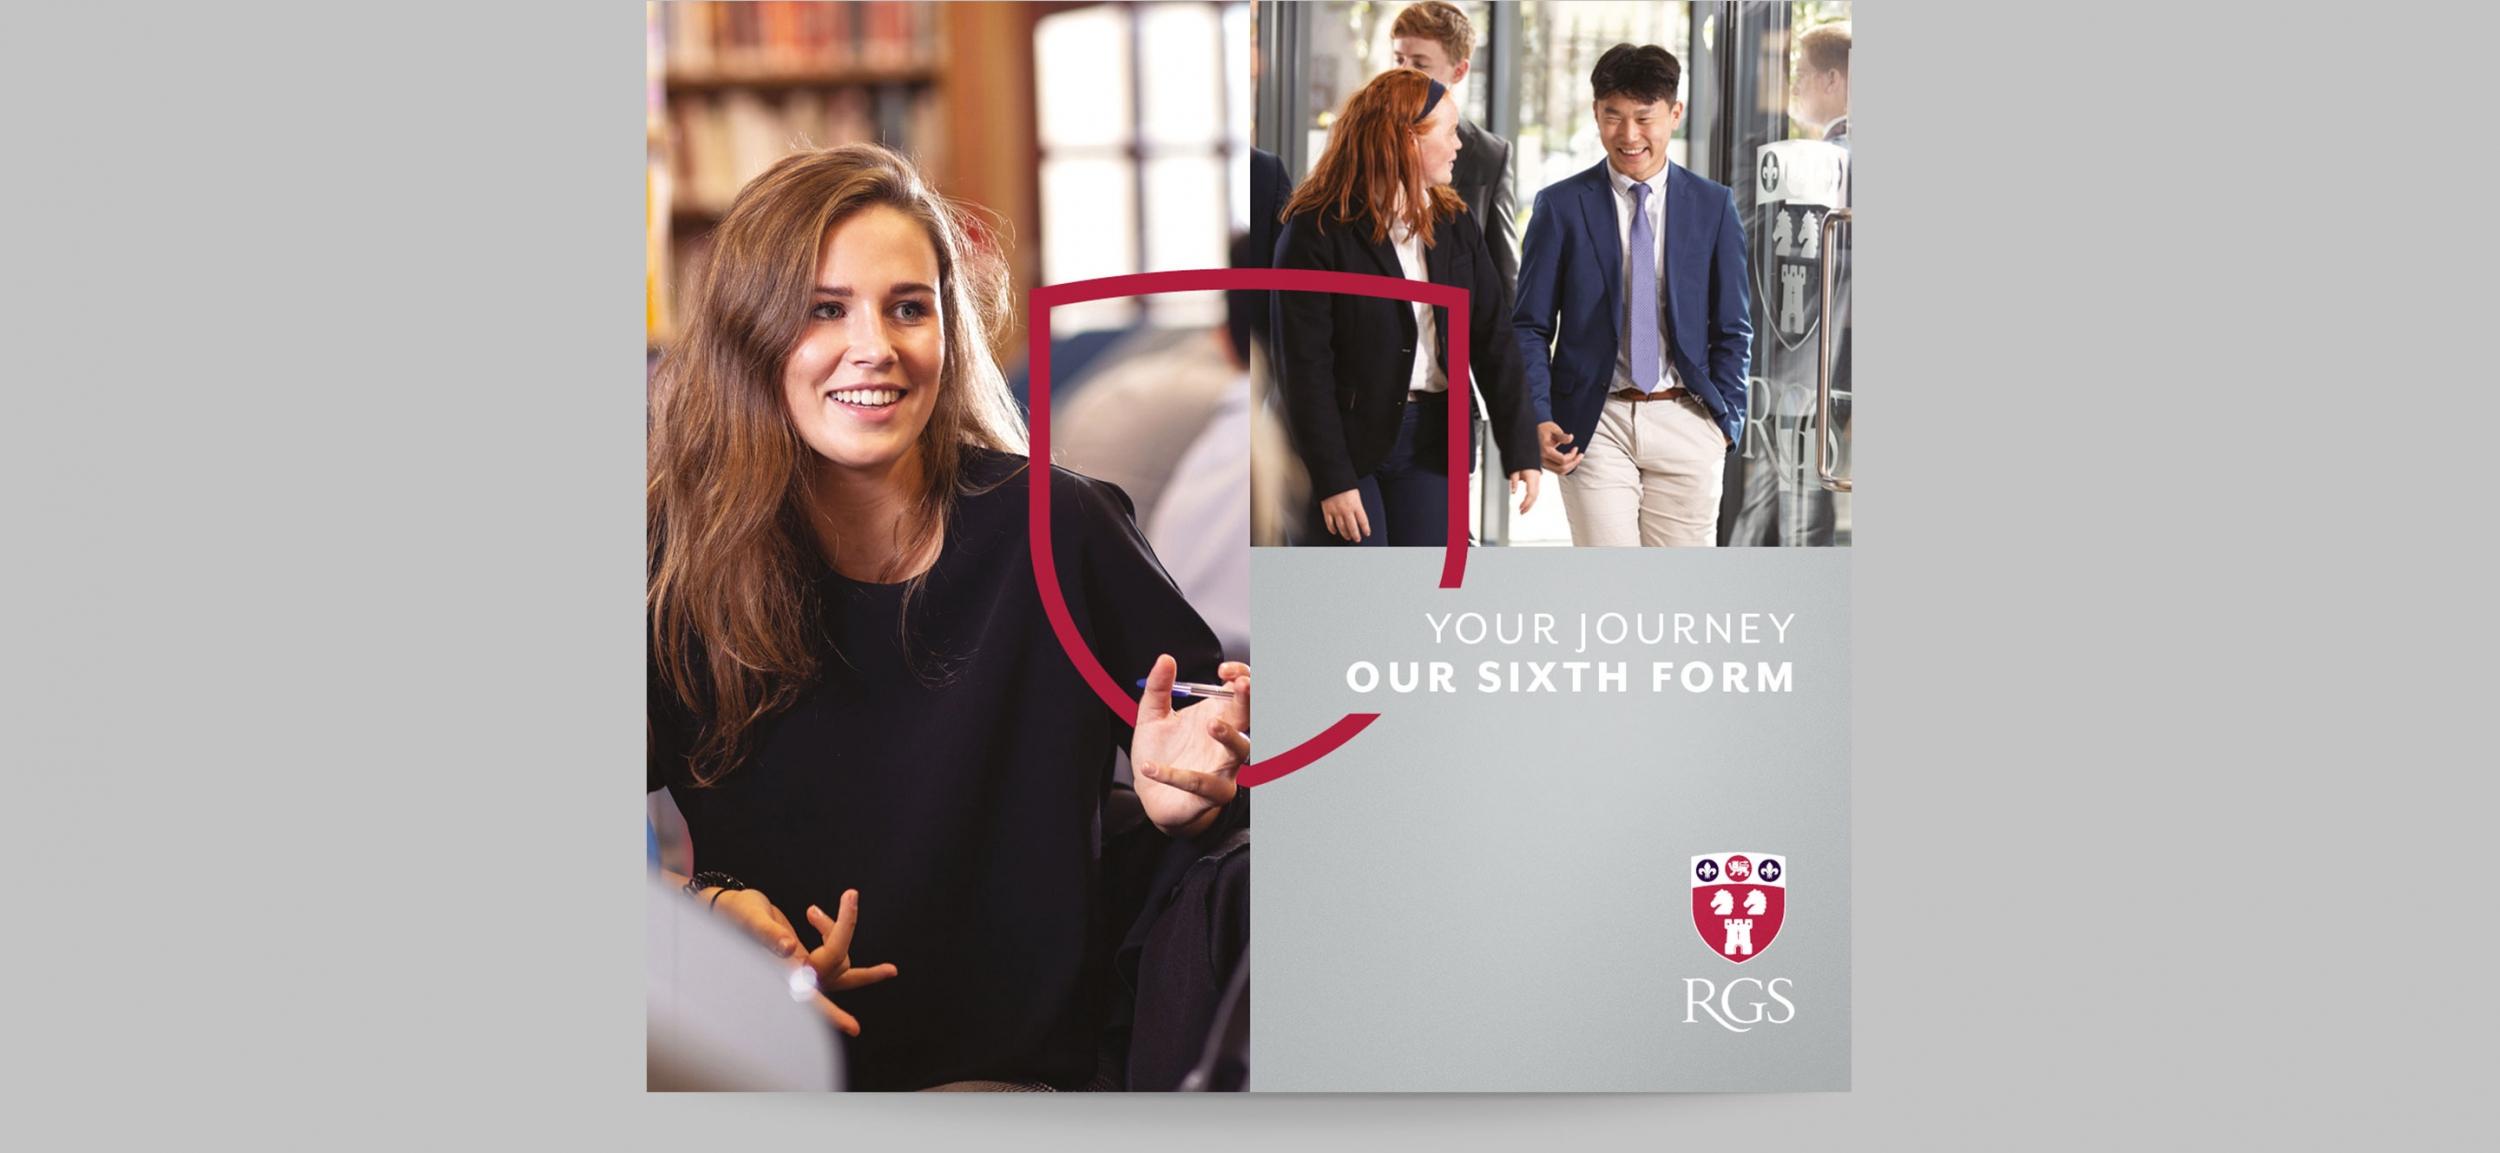 Independent school branding and sixth form brochure for Royal Grammar School